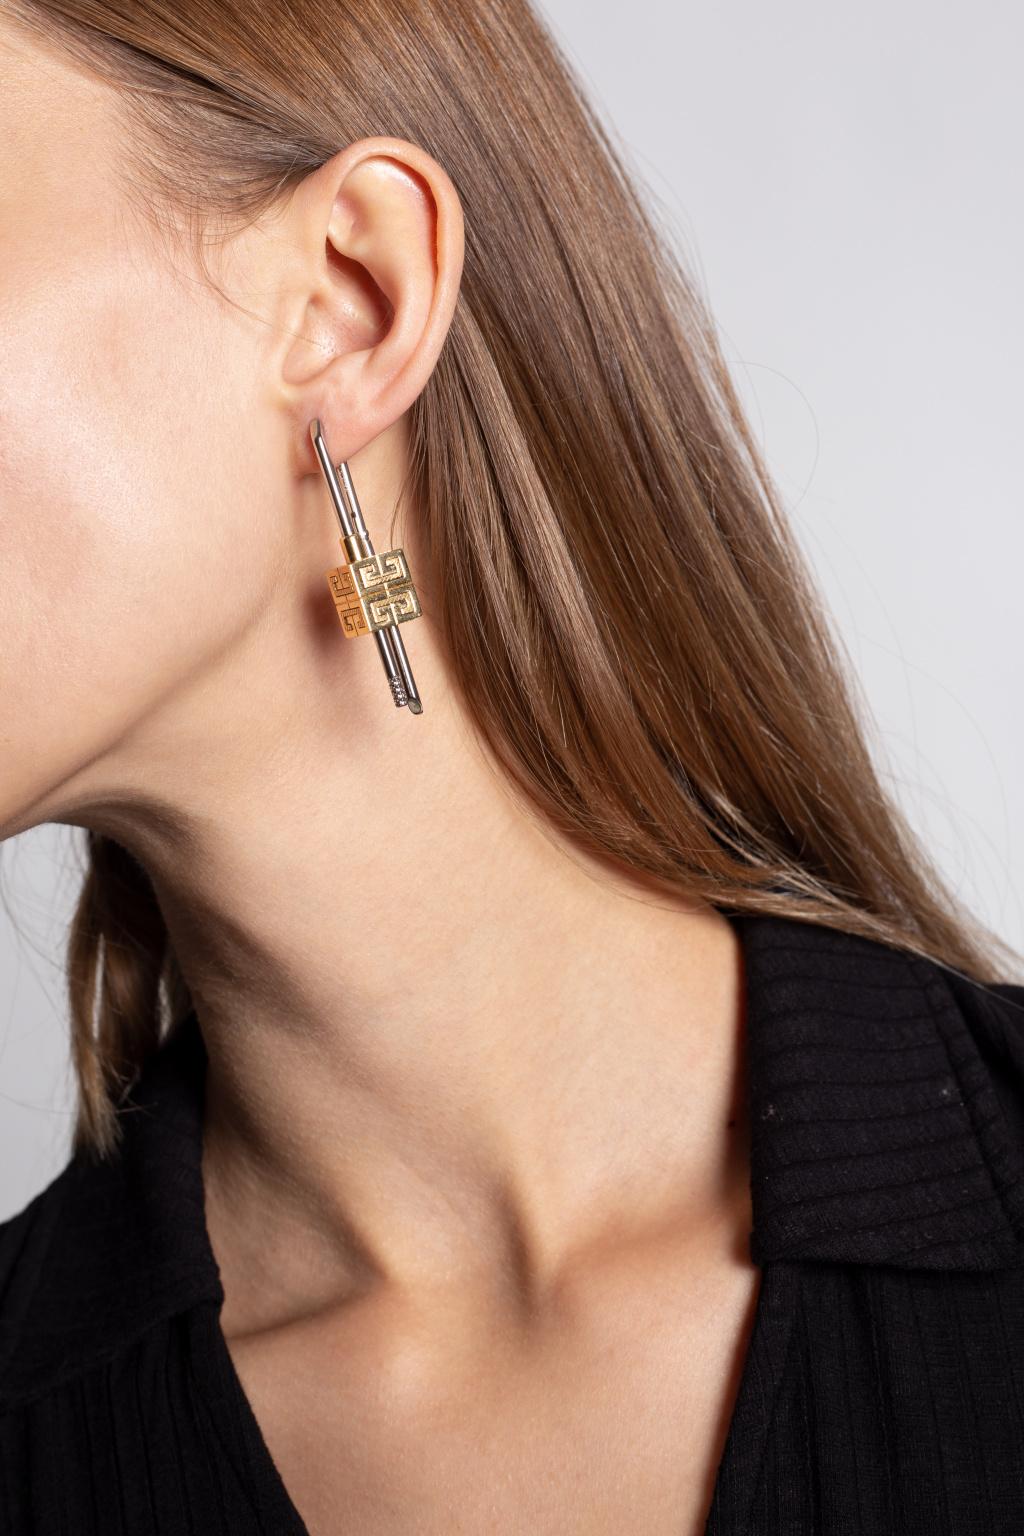 Givenchy Asymmetrical earrings